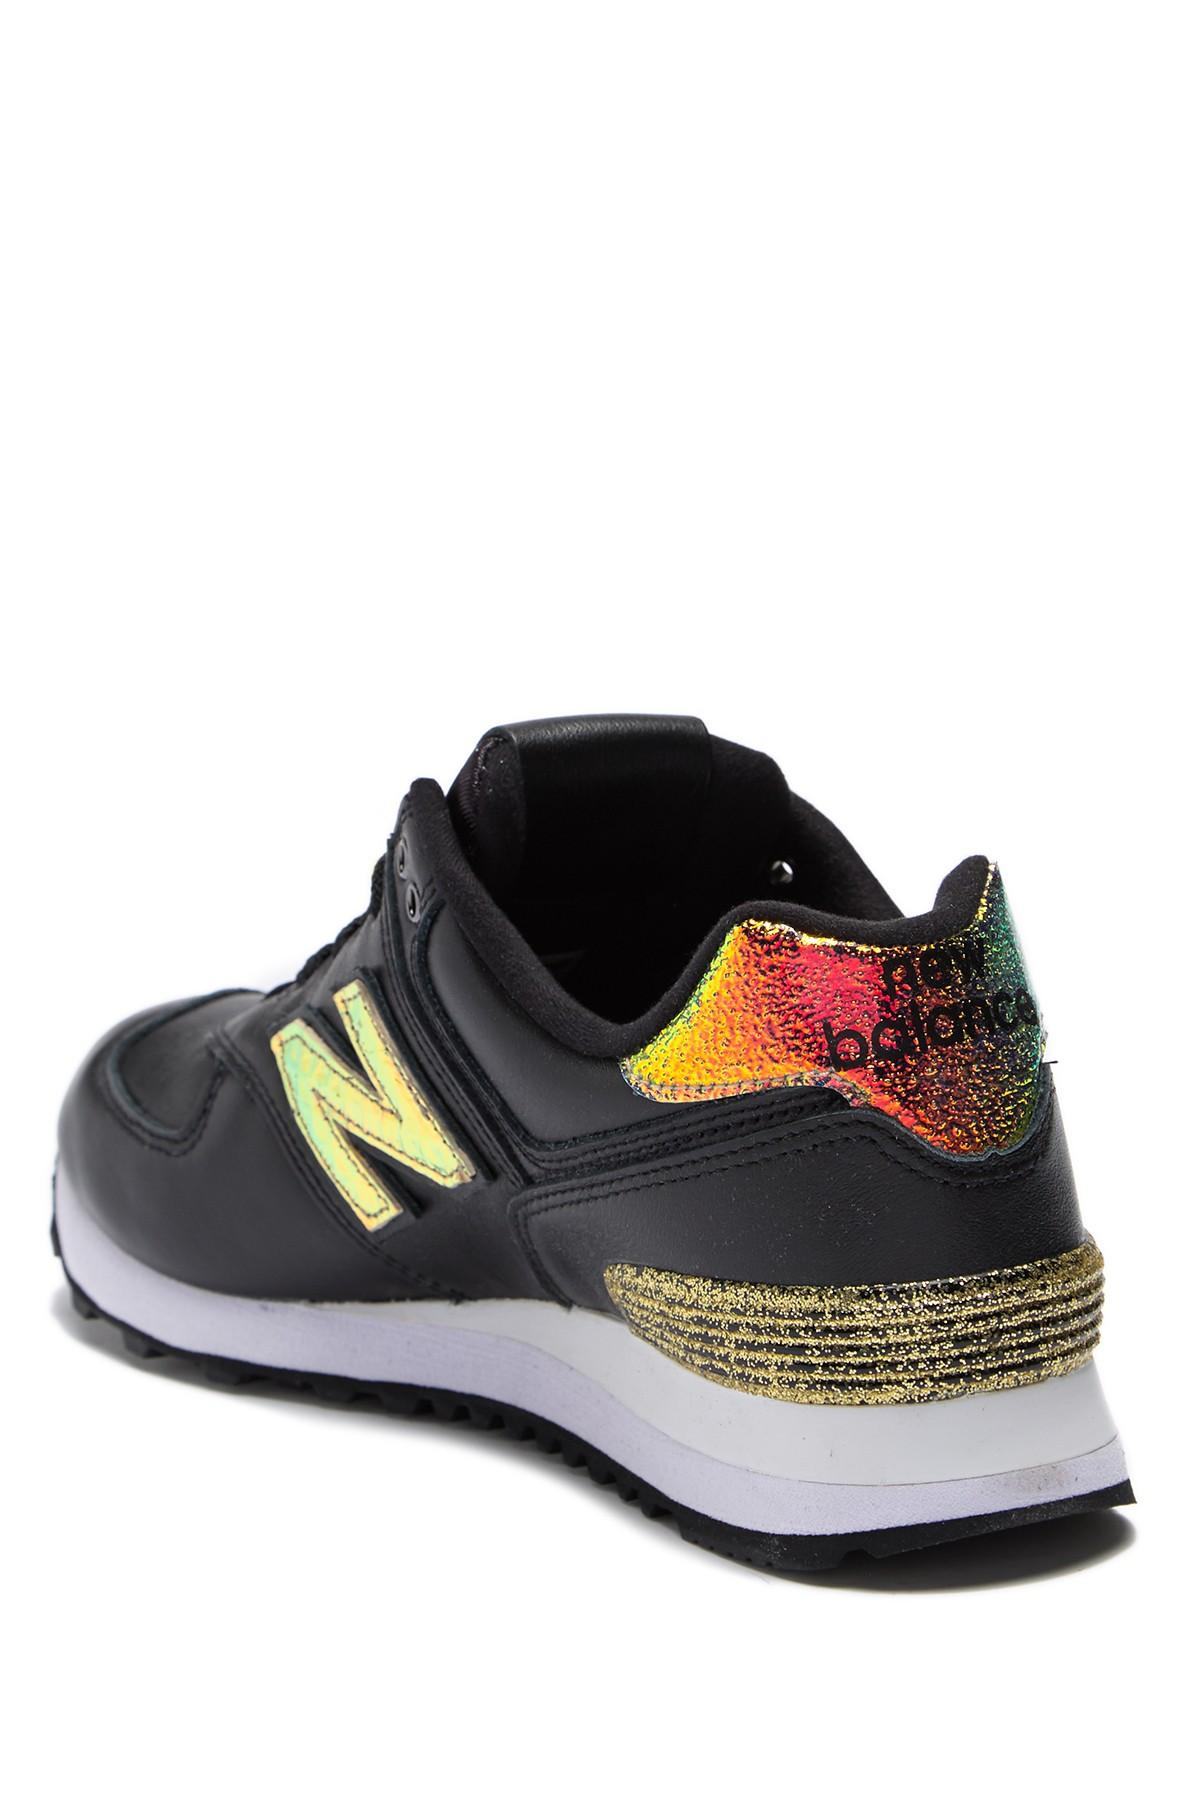 info for db2a2 90198 New Balance 574 Glitter Punk Sneaker (women) in Black - Lyst